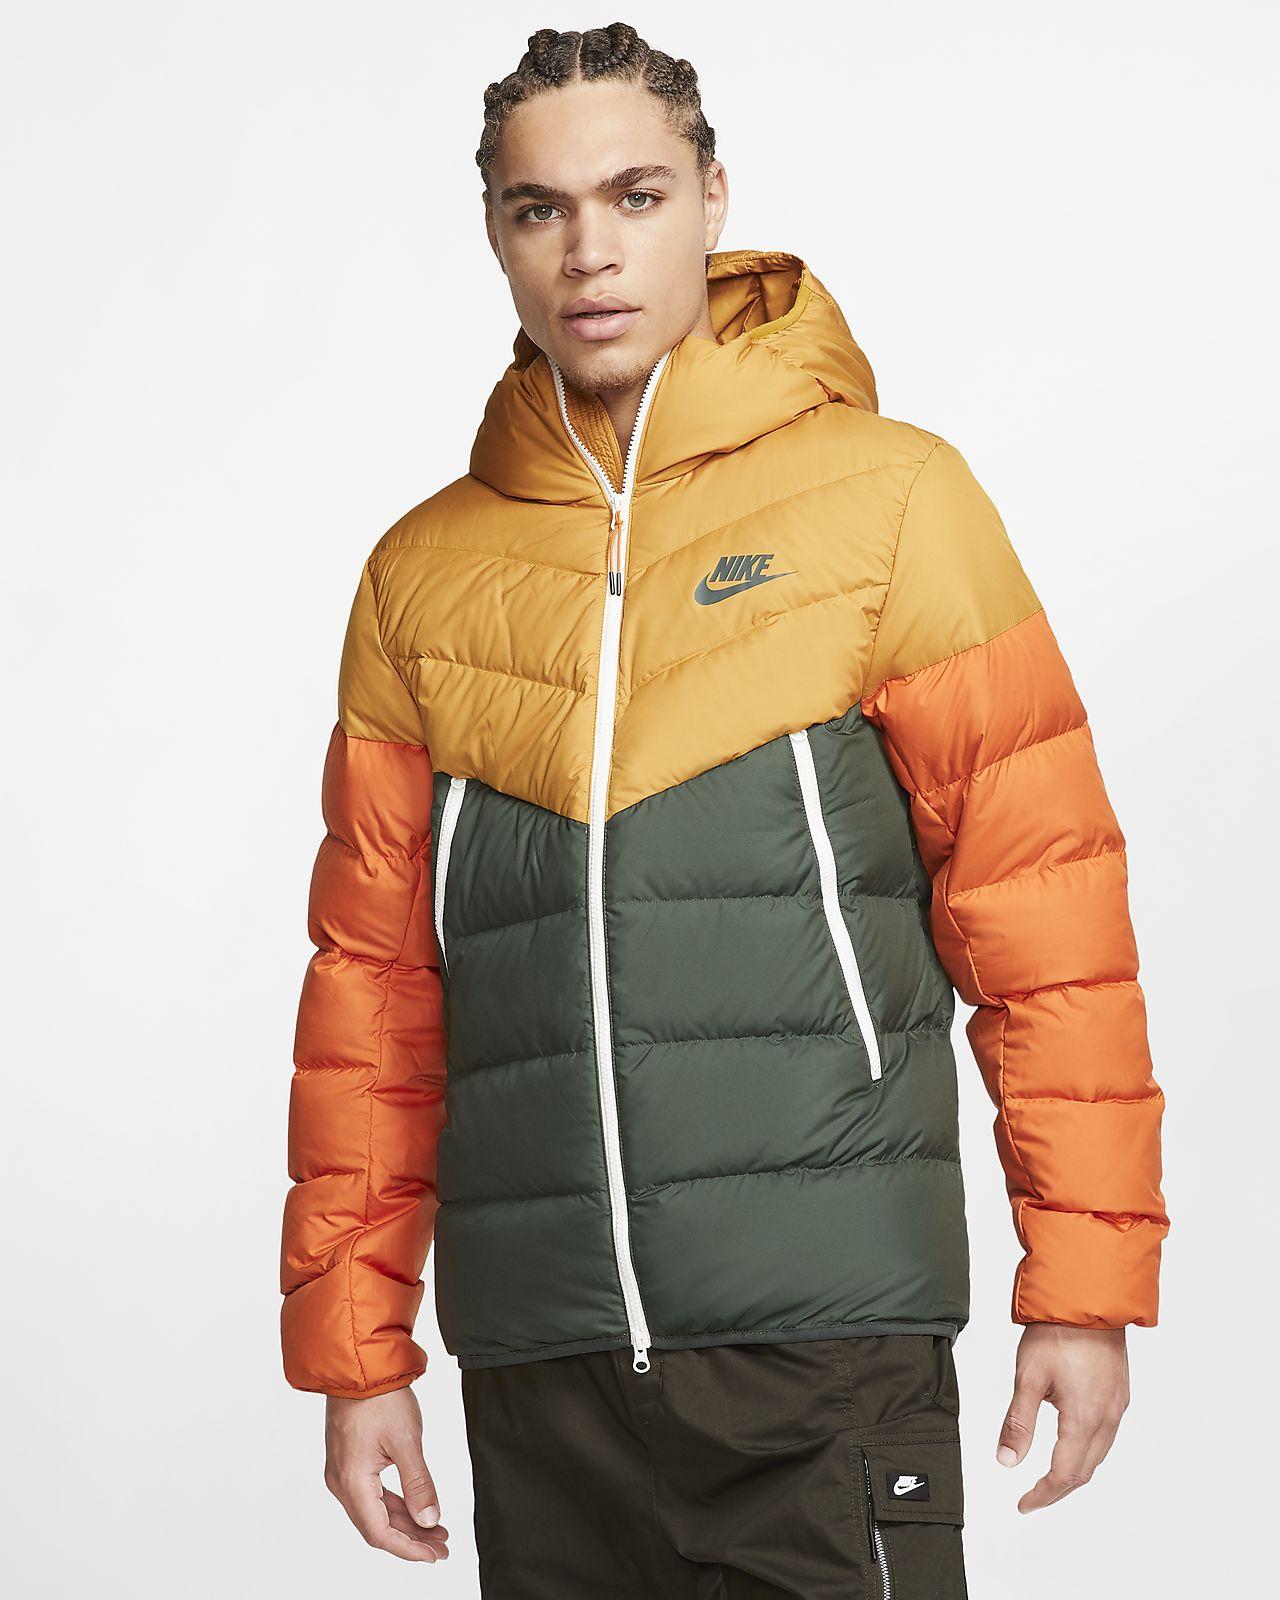 Nike Windrunner Jacke Puffer Kapuze Down mit Sportswear Fill bvI7gm6Yfy